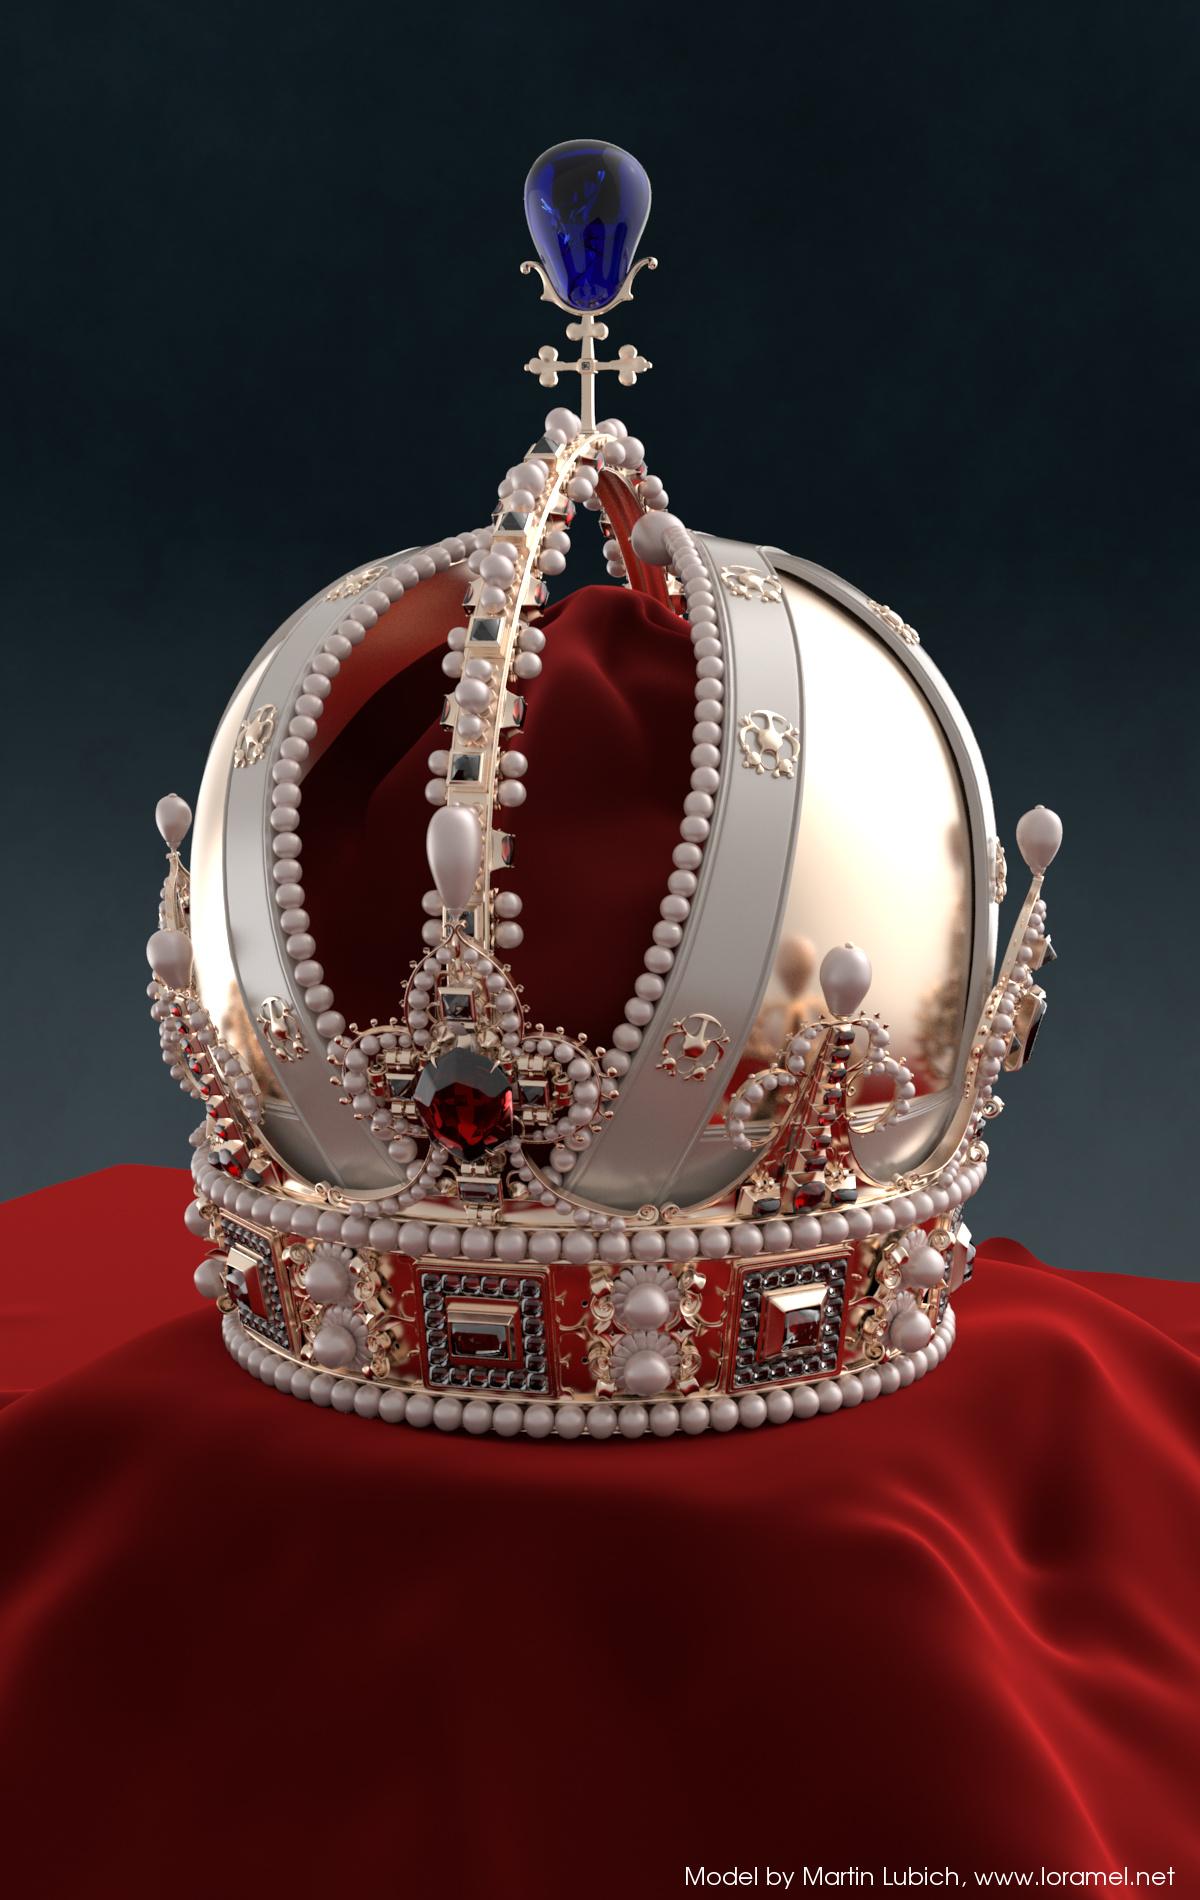 http://www.guerillarender.com/images/crown.jpg